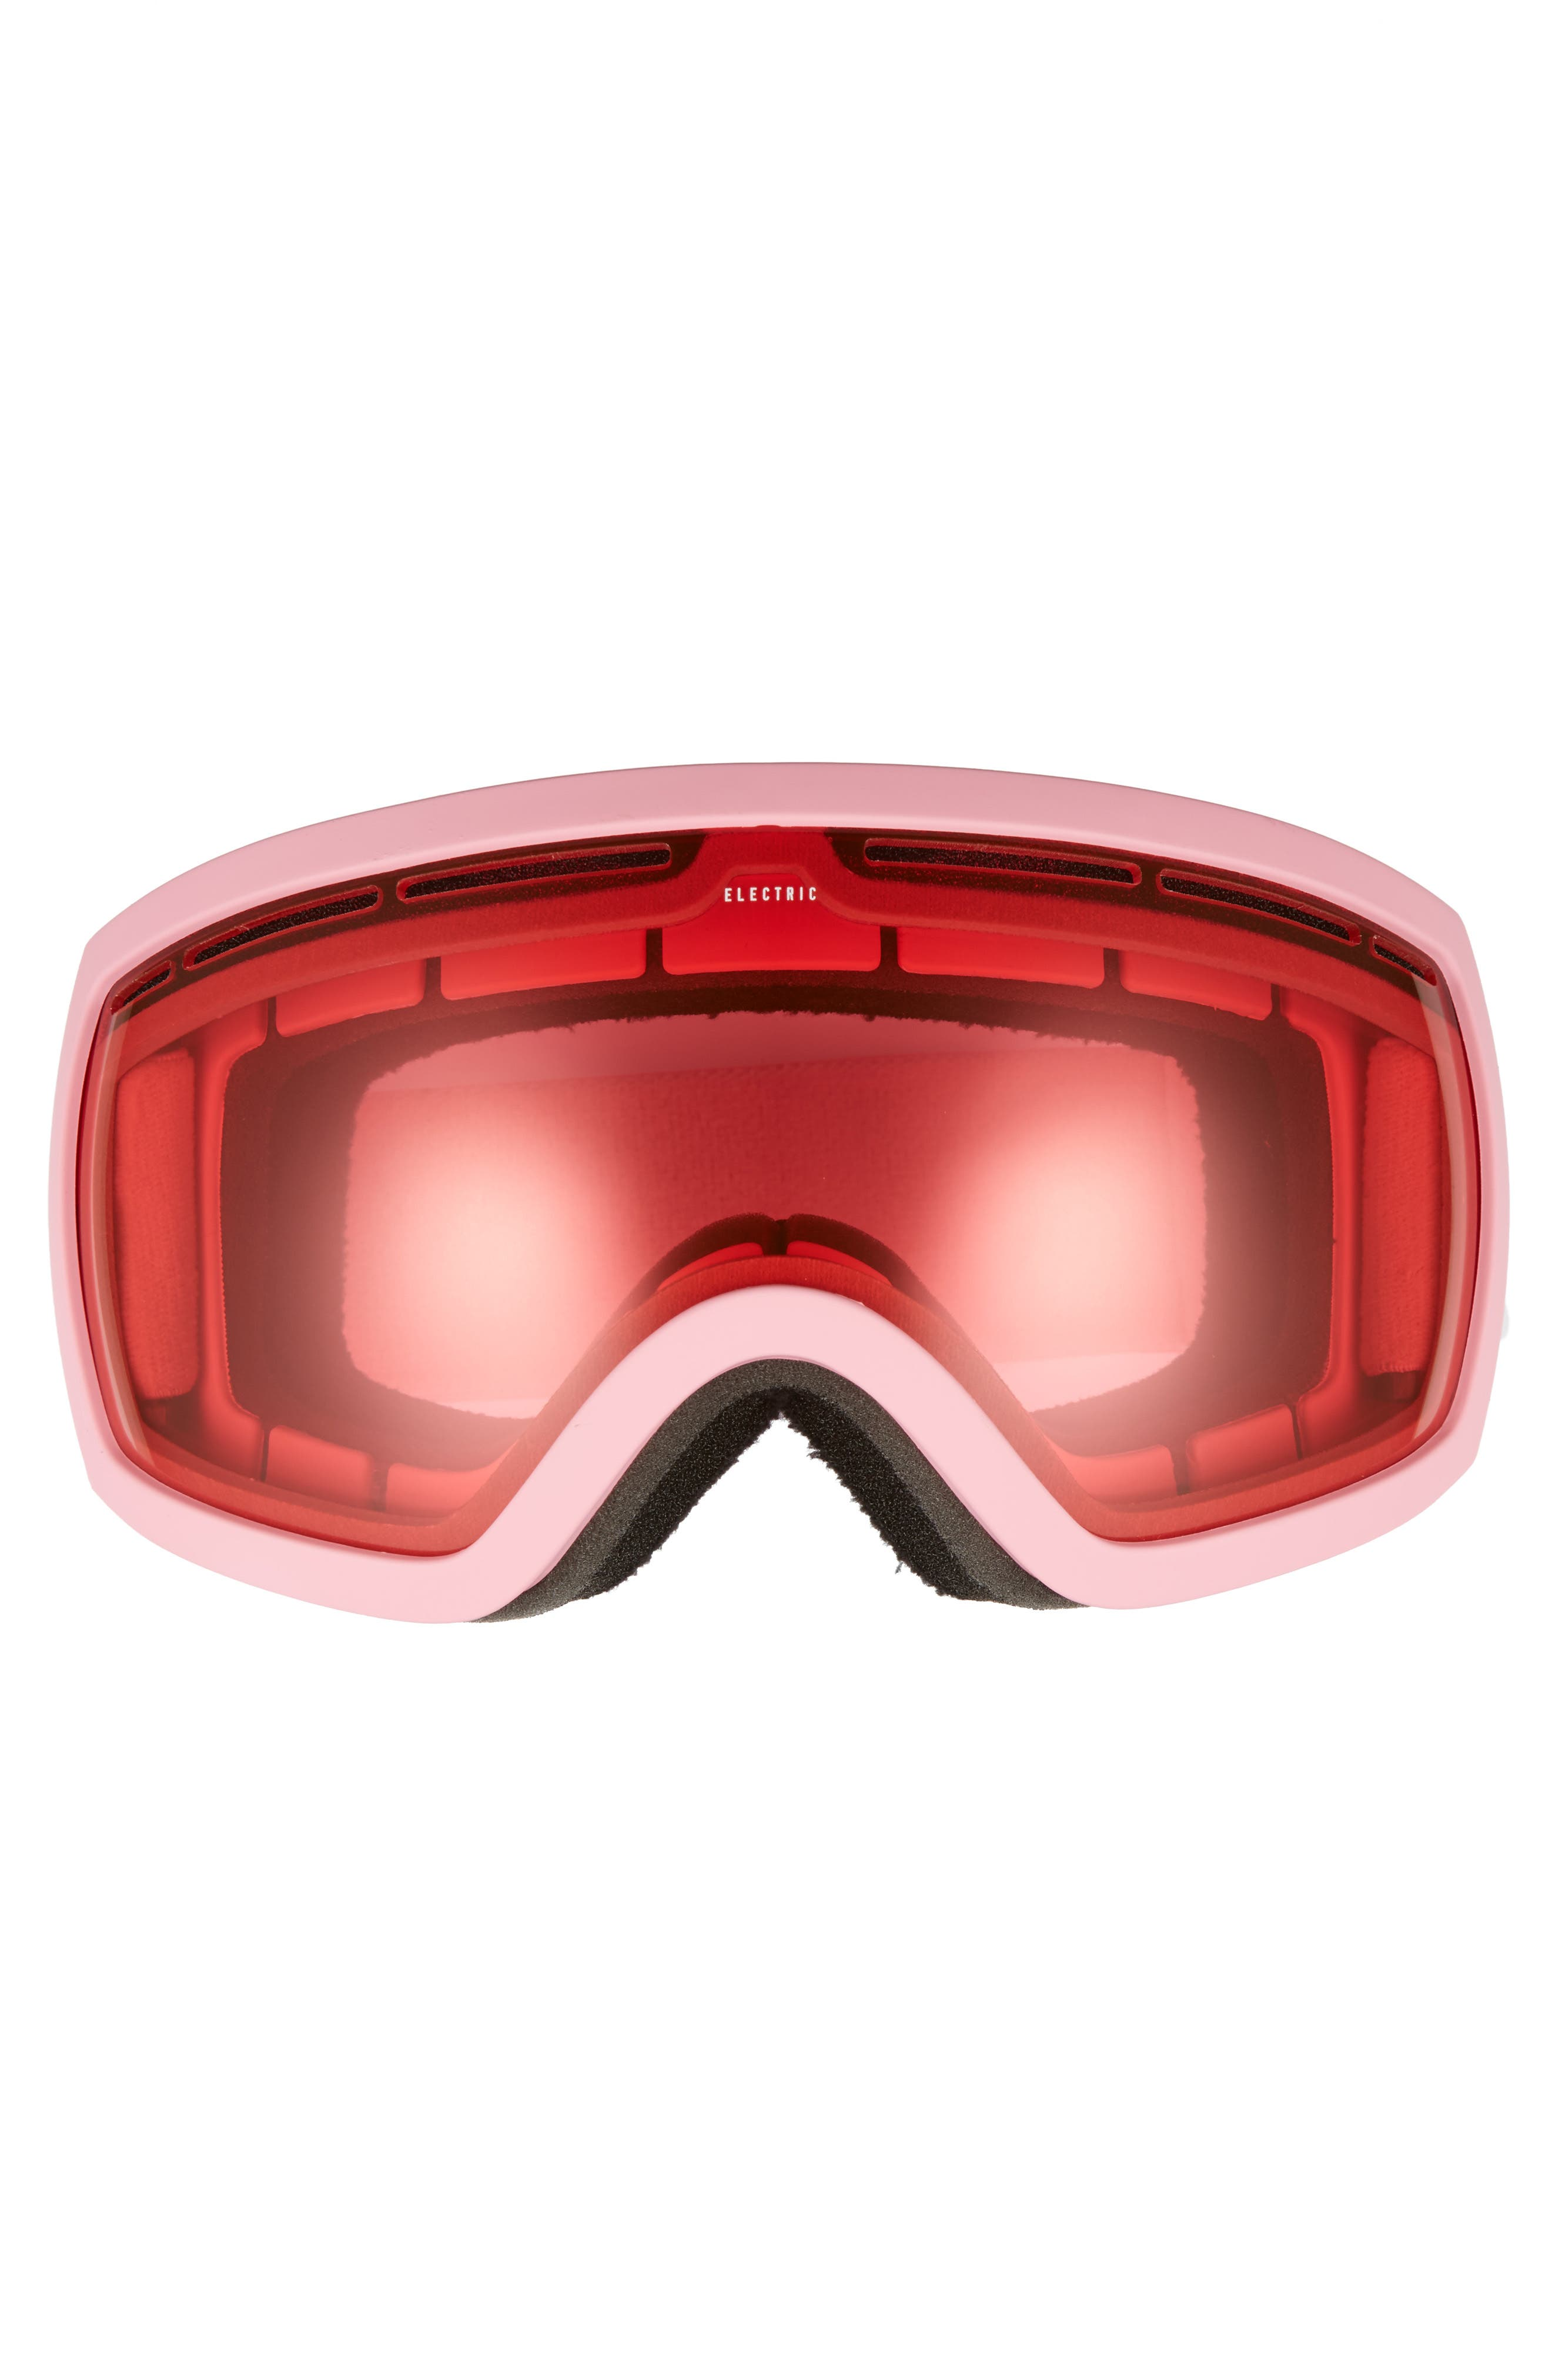 EG2.5 Snow Goggles,                             Alternate thumbnail 17, color,